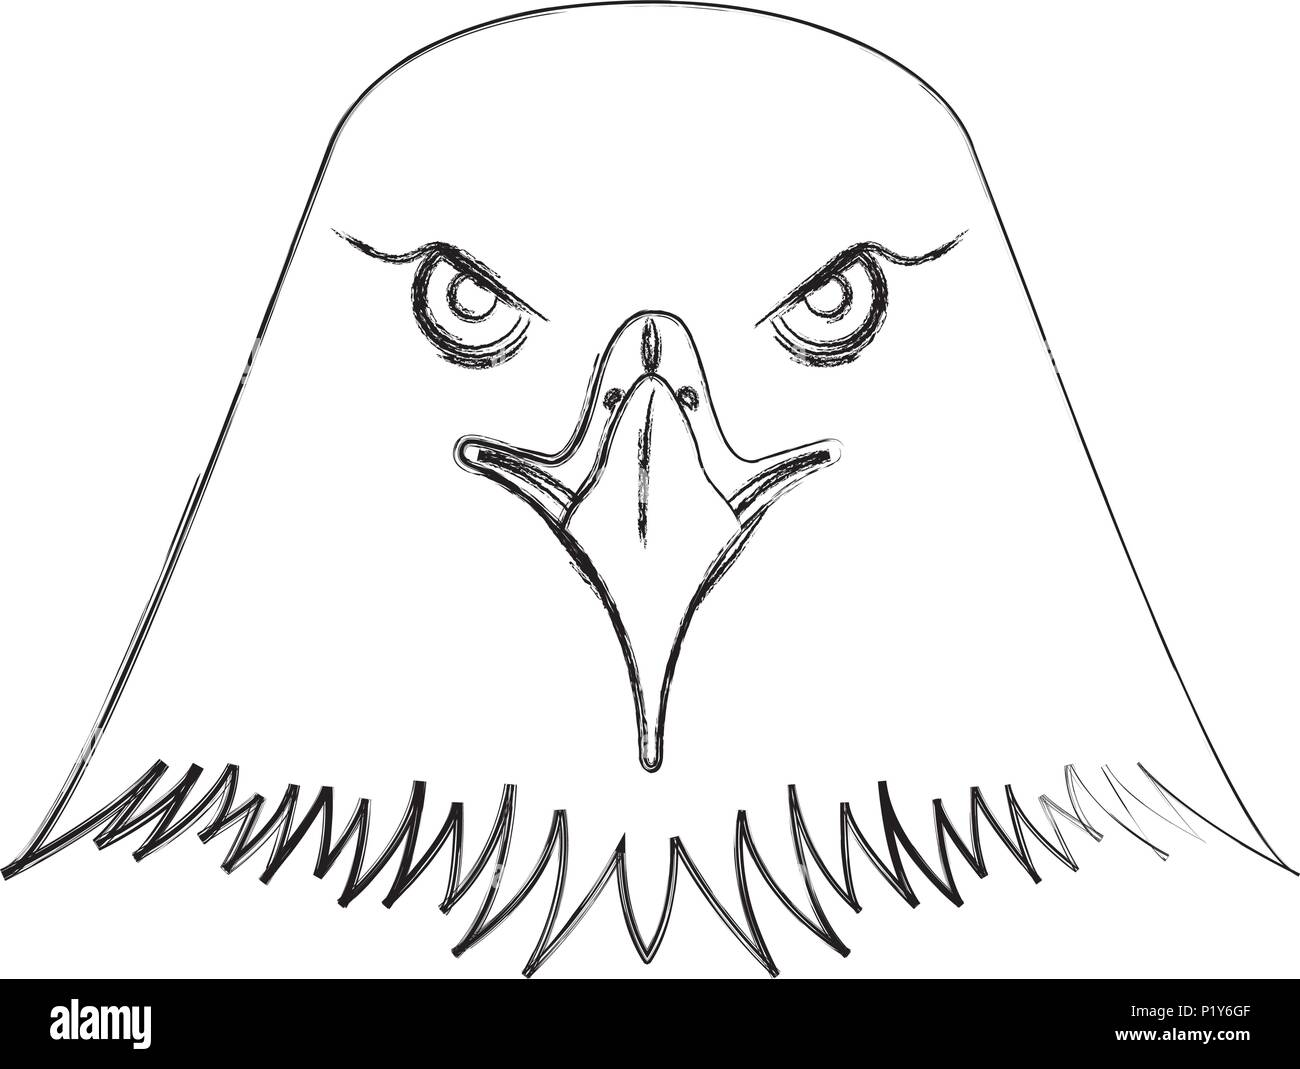 American Bald Eagle Head Vector Illustration Design